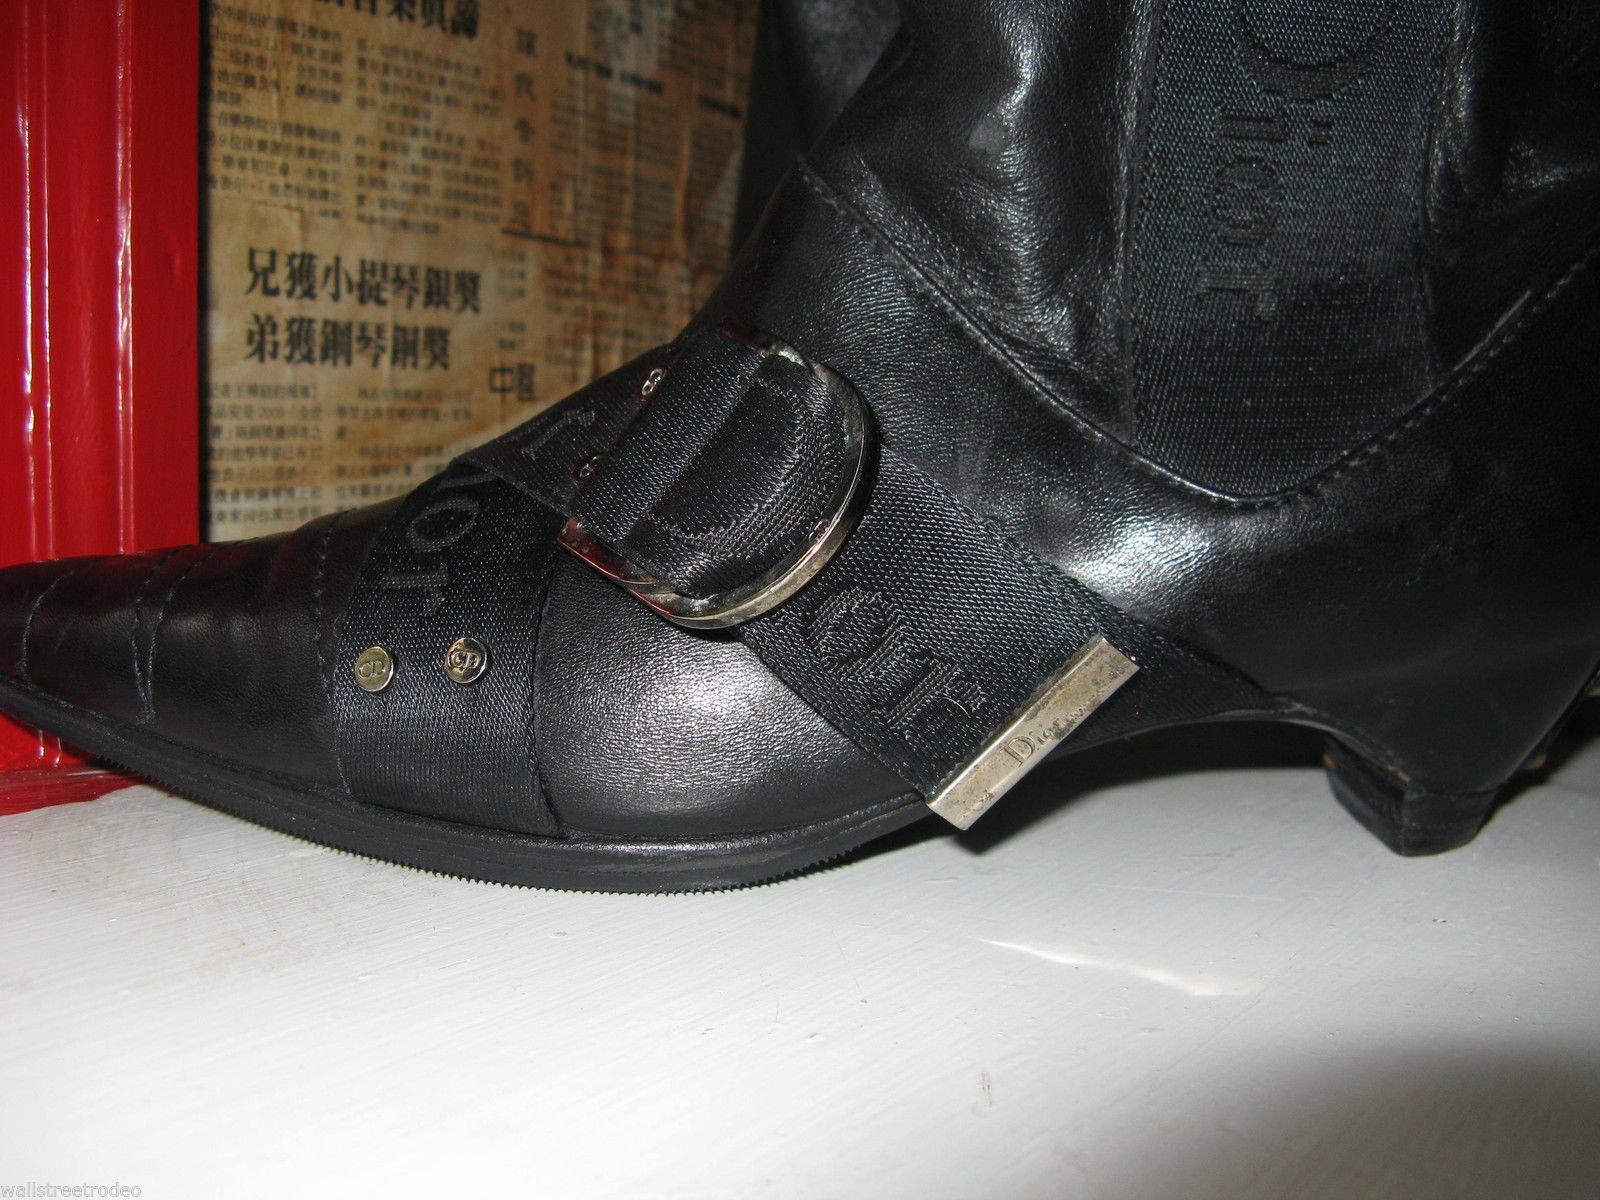 Dior biker logo quilted butter leather motorcylce punk runway boots 6 36 UK3.5 image 6